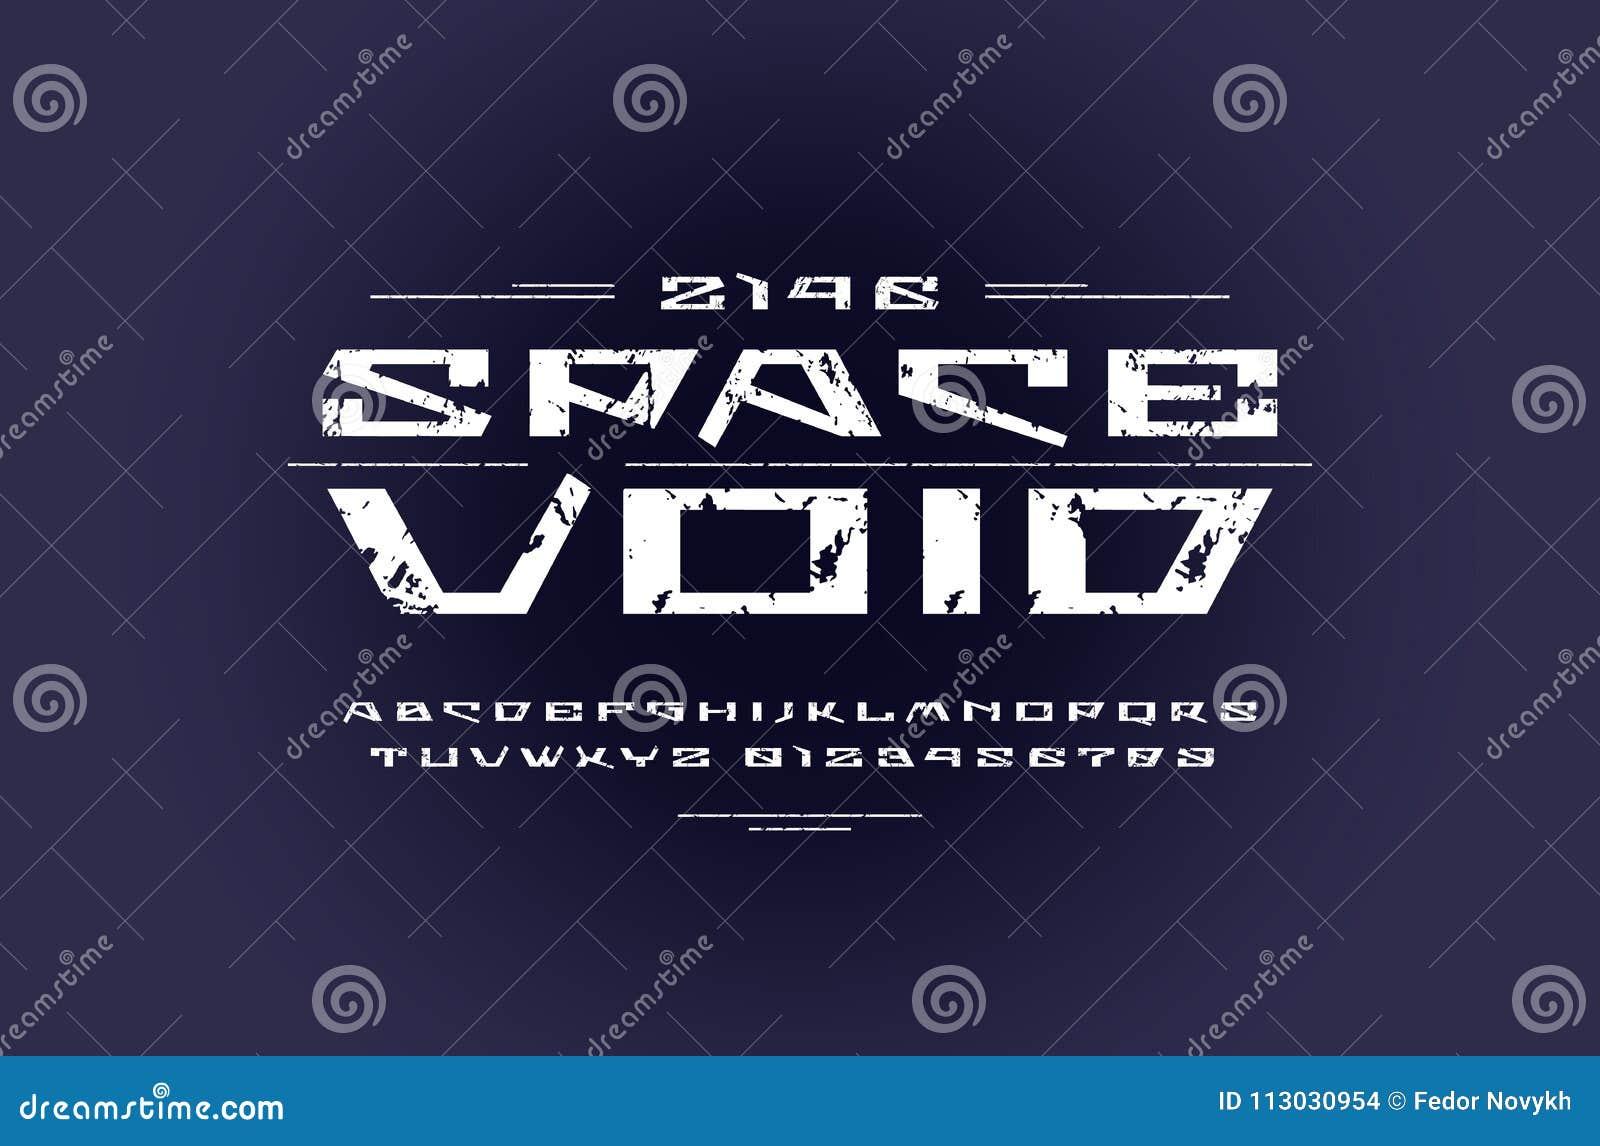 Fuente geométrica de sans serif en estilo futurista